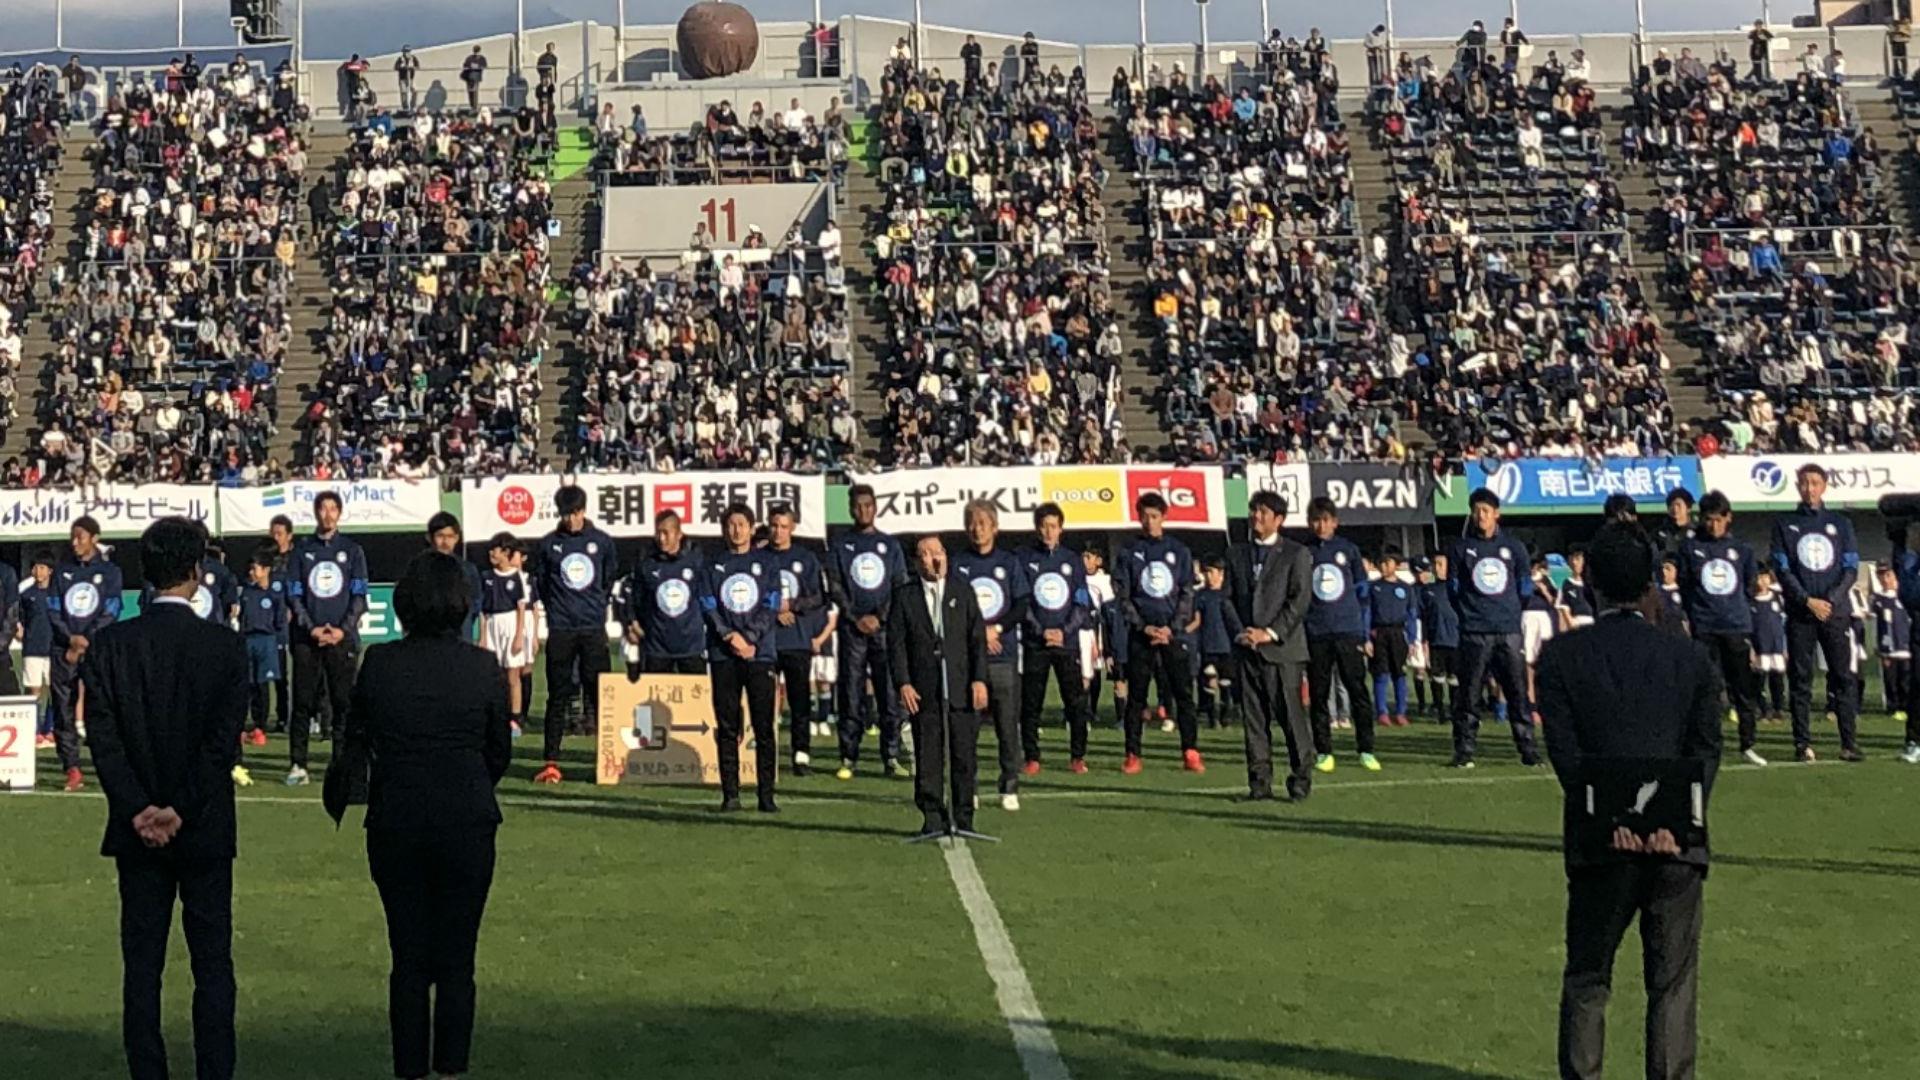 2018-11-26-kagoshima-hara-mayer